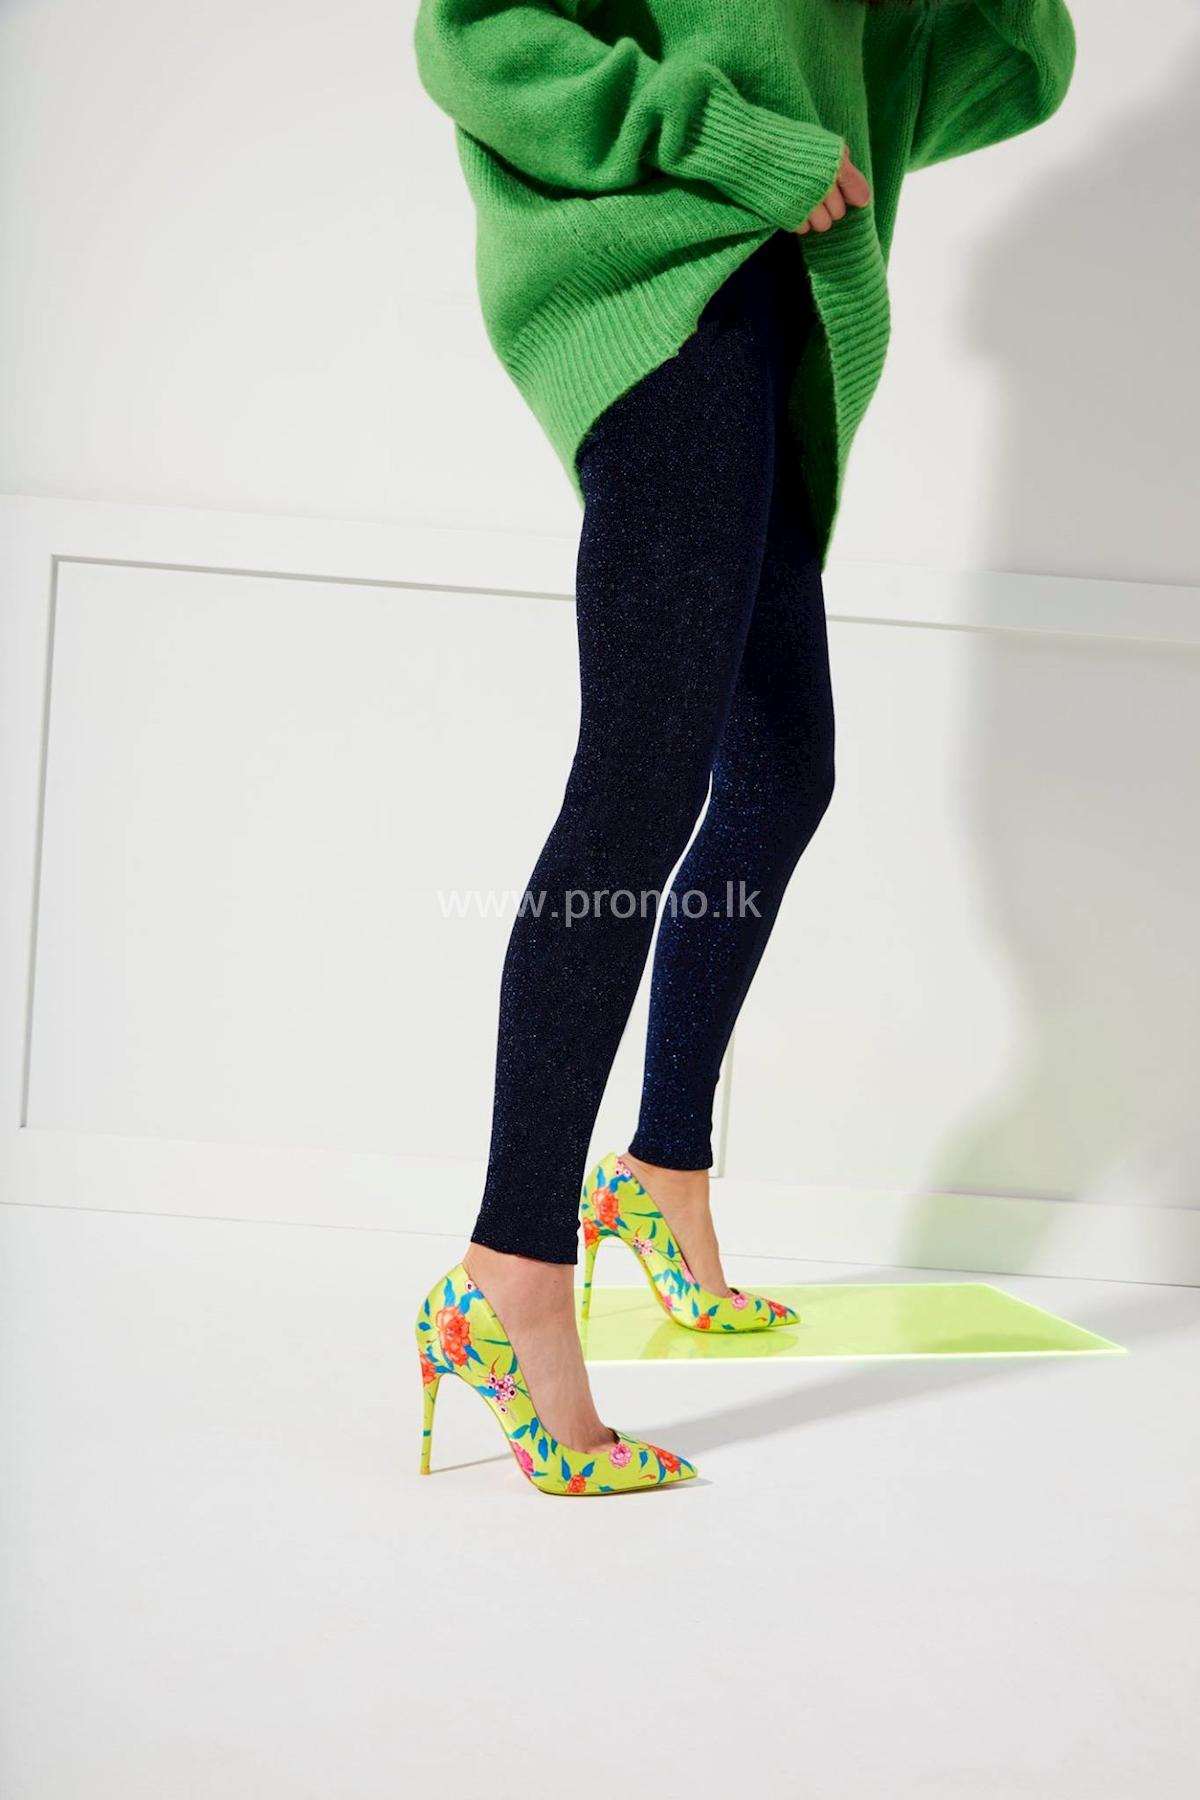 f15ceb0b0e Upto 50% Off on ALDO Shoes at Odel